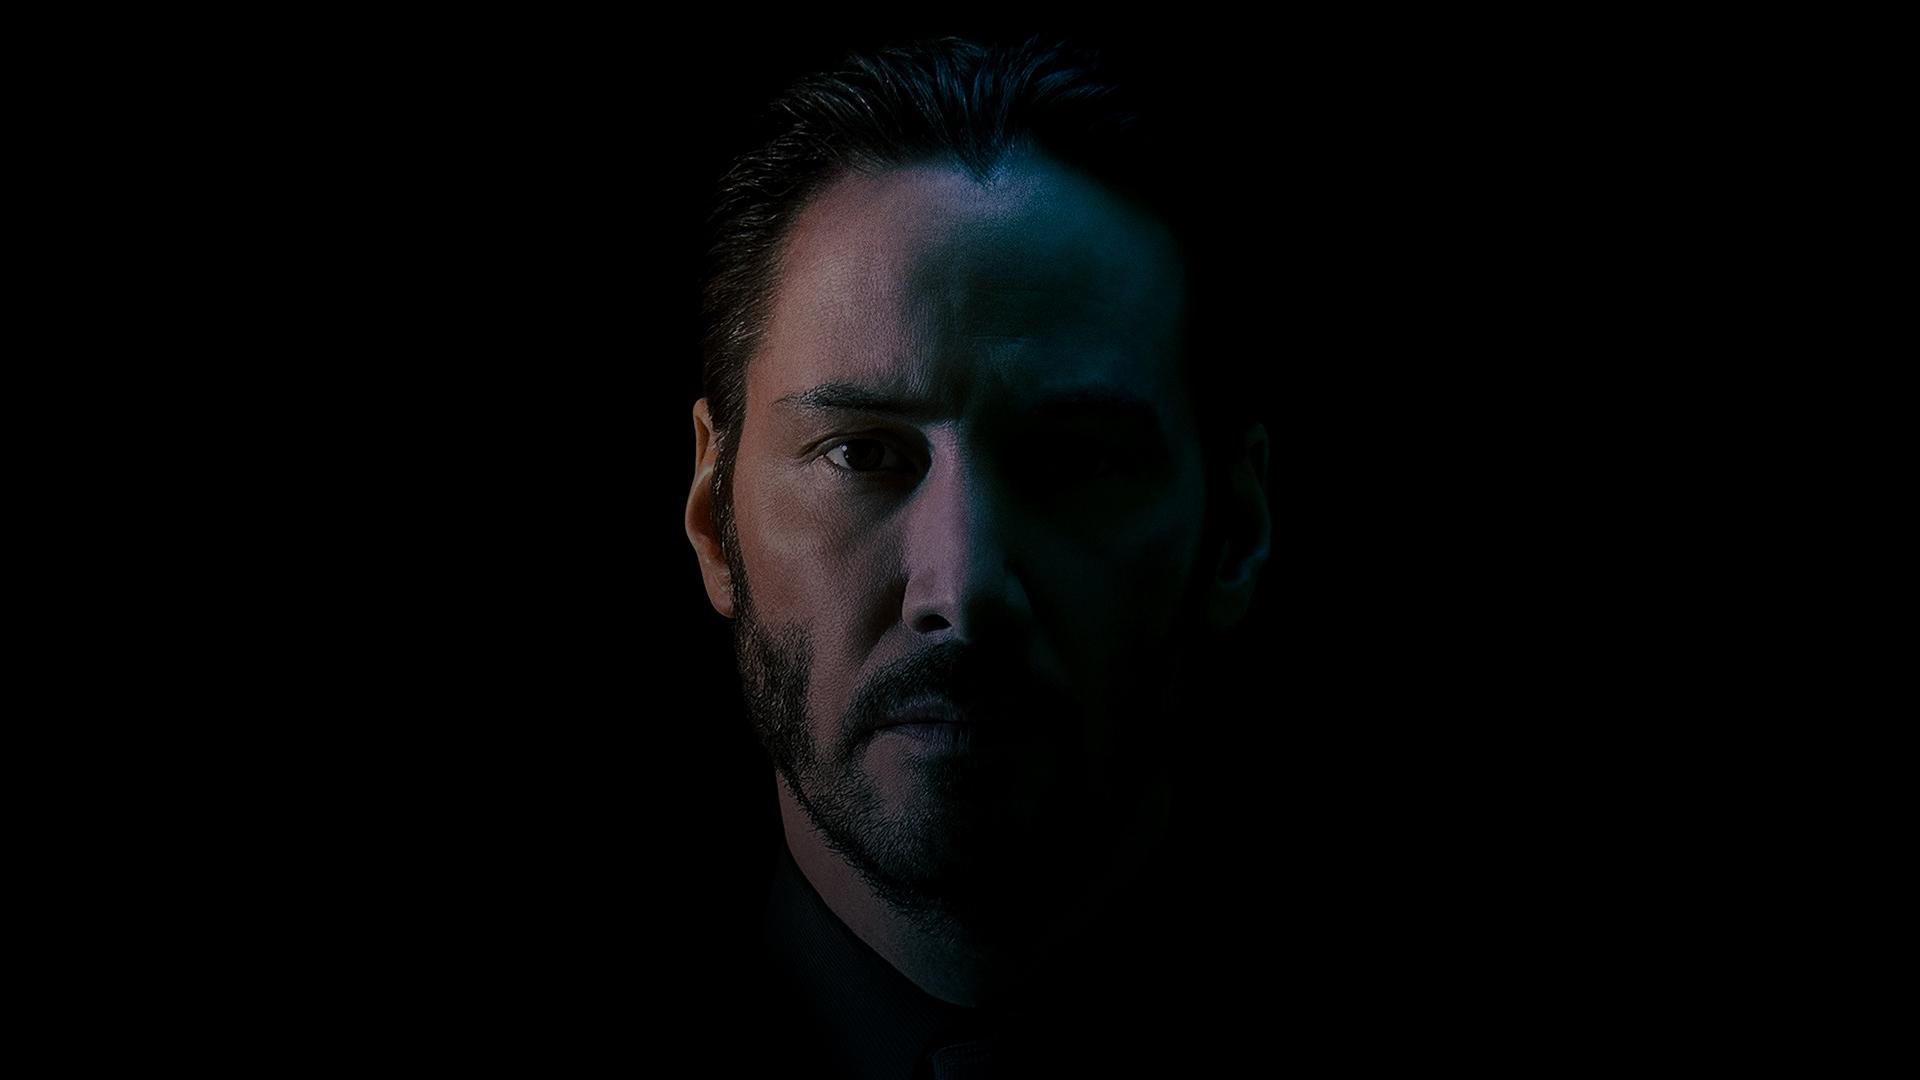 John Wick Keanu Reeves Ian Mcshane Willem Dafoe Lionsgate